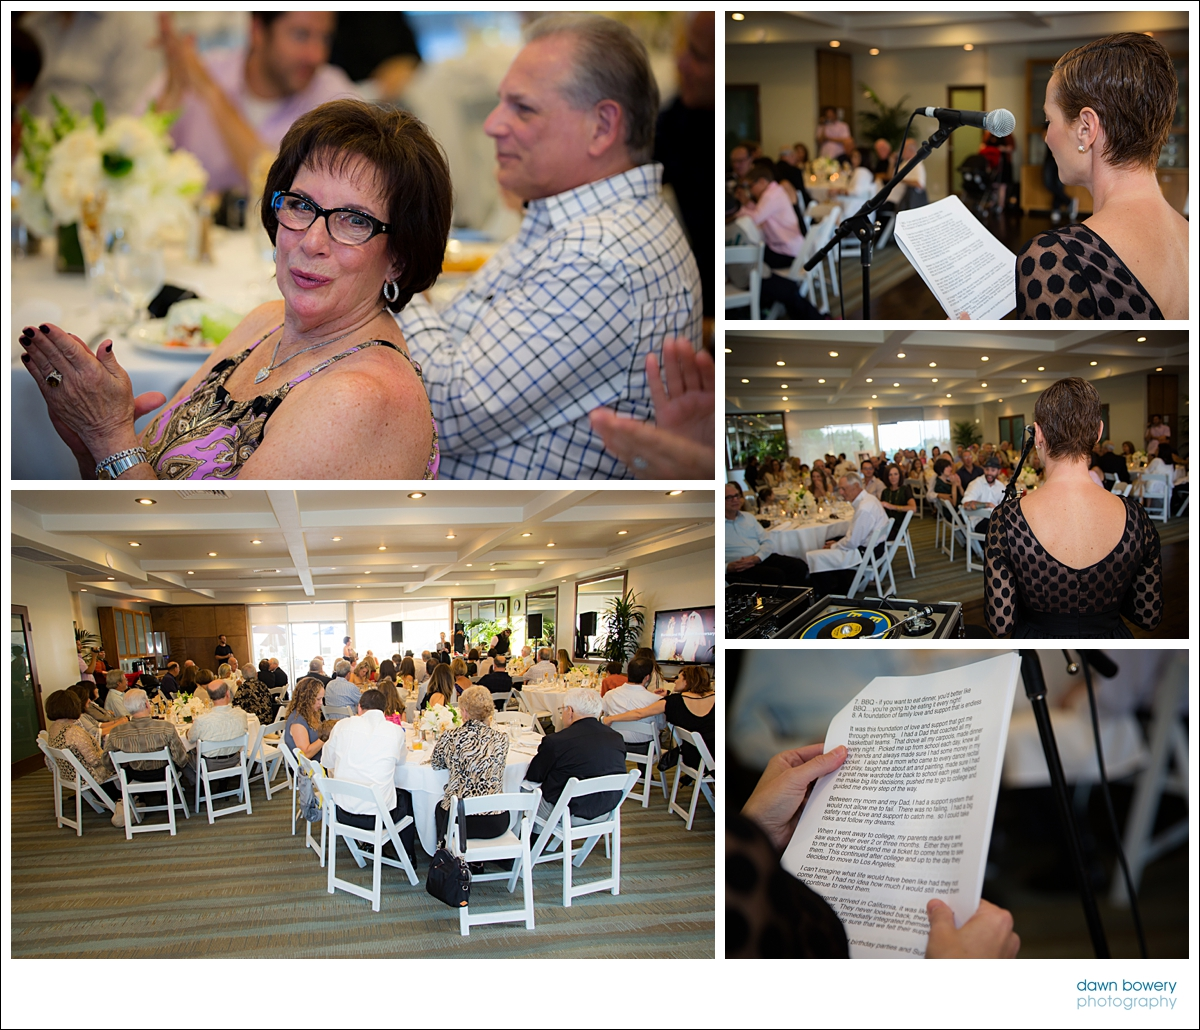 Los Angeles Family Event Photographer celebration